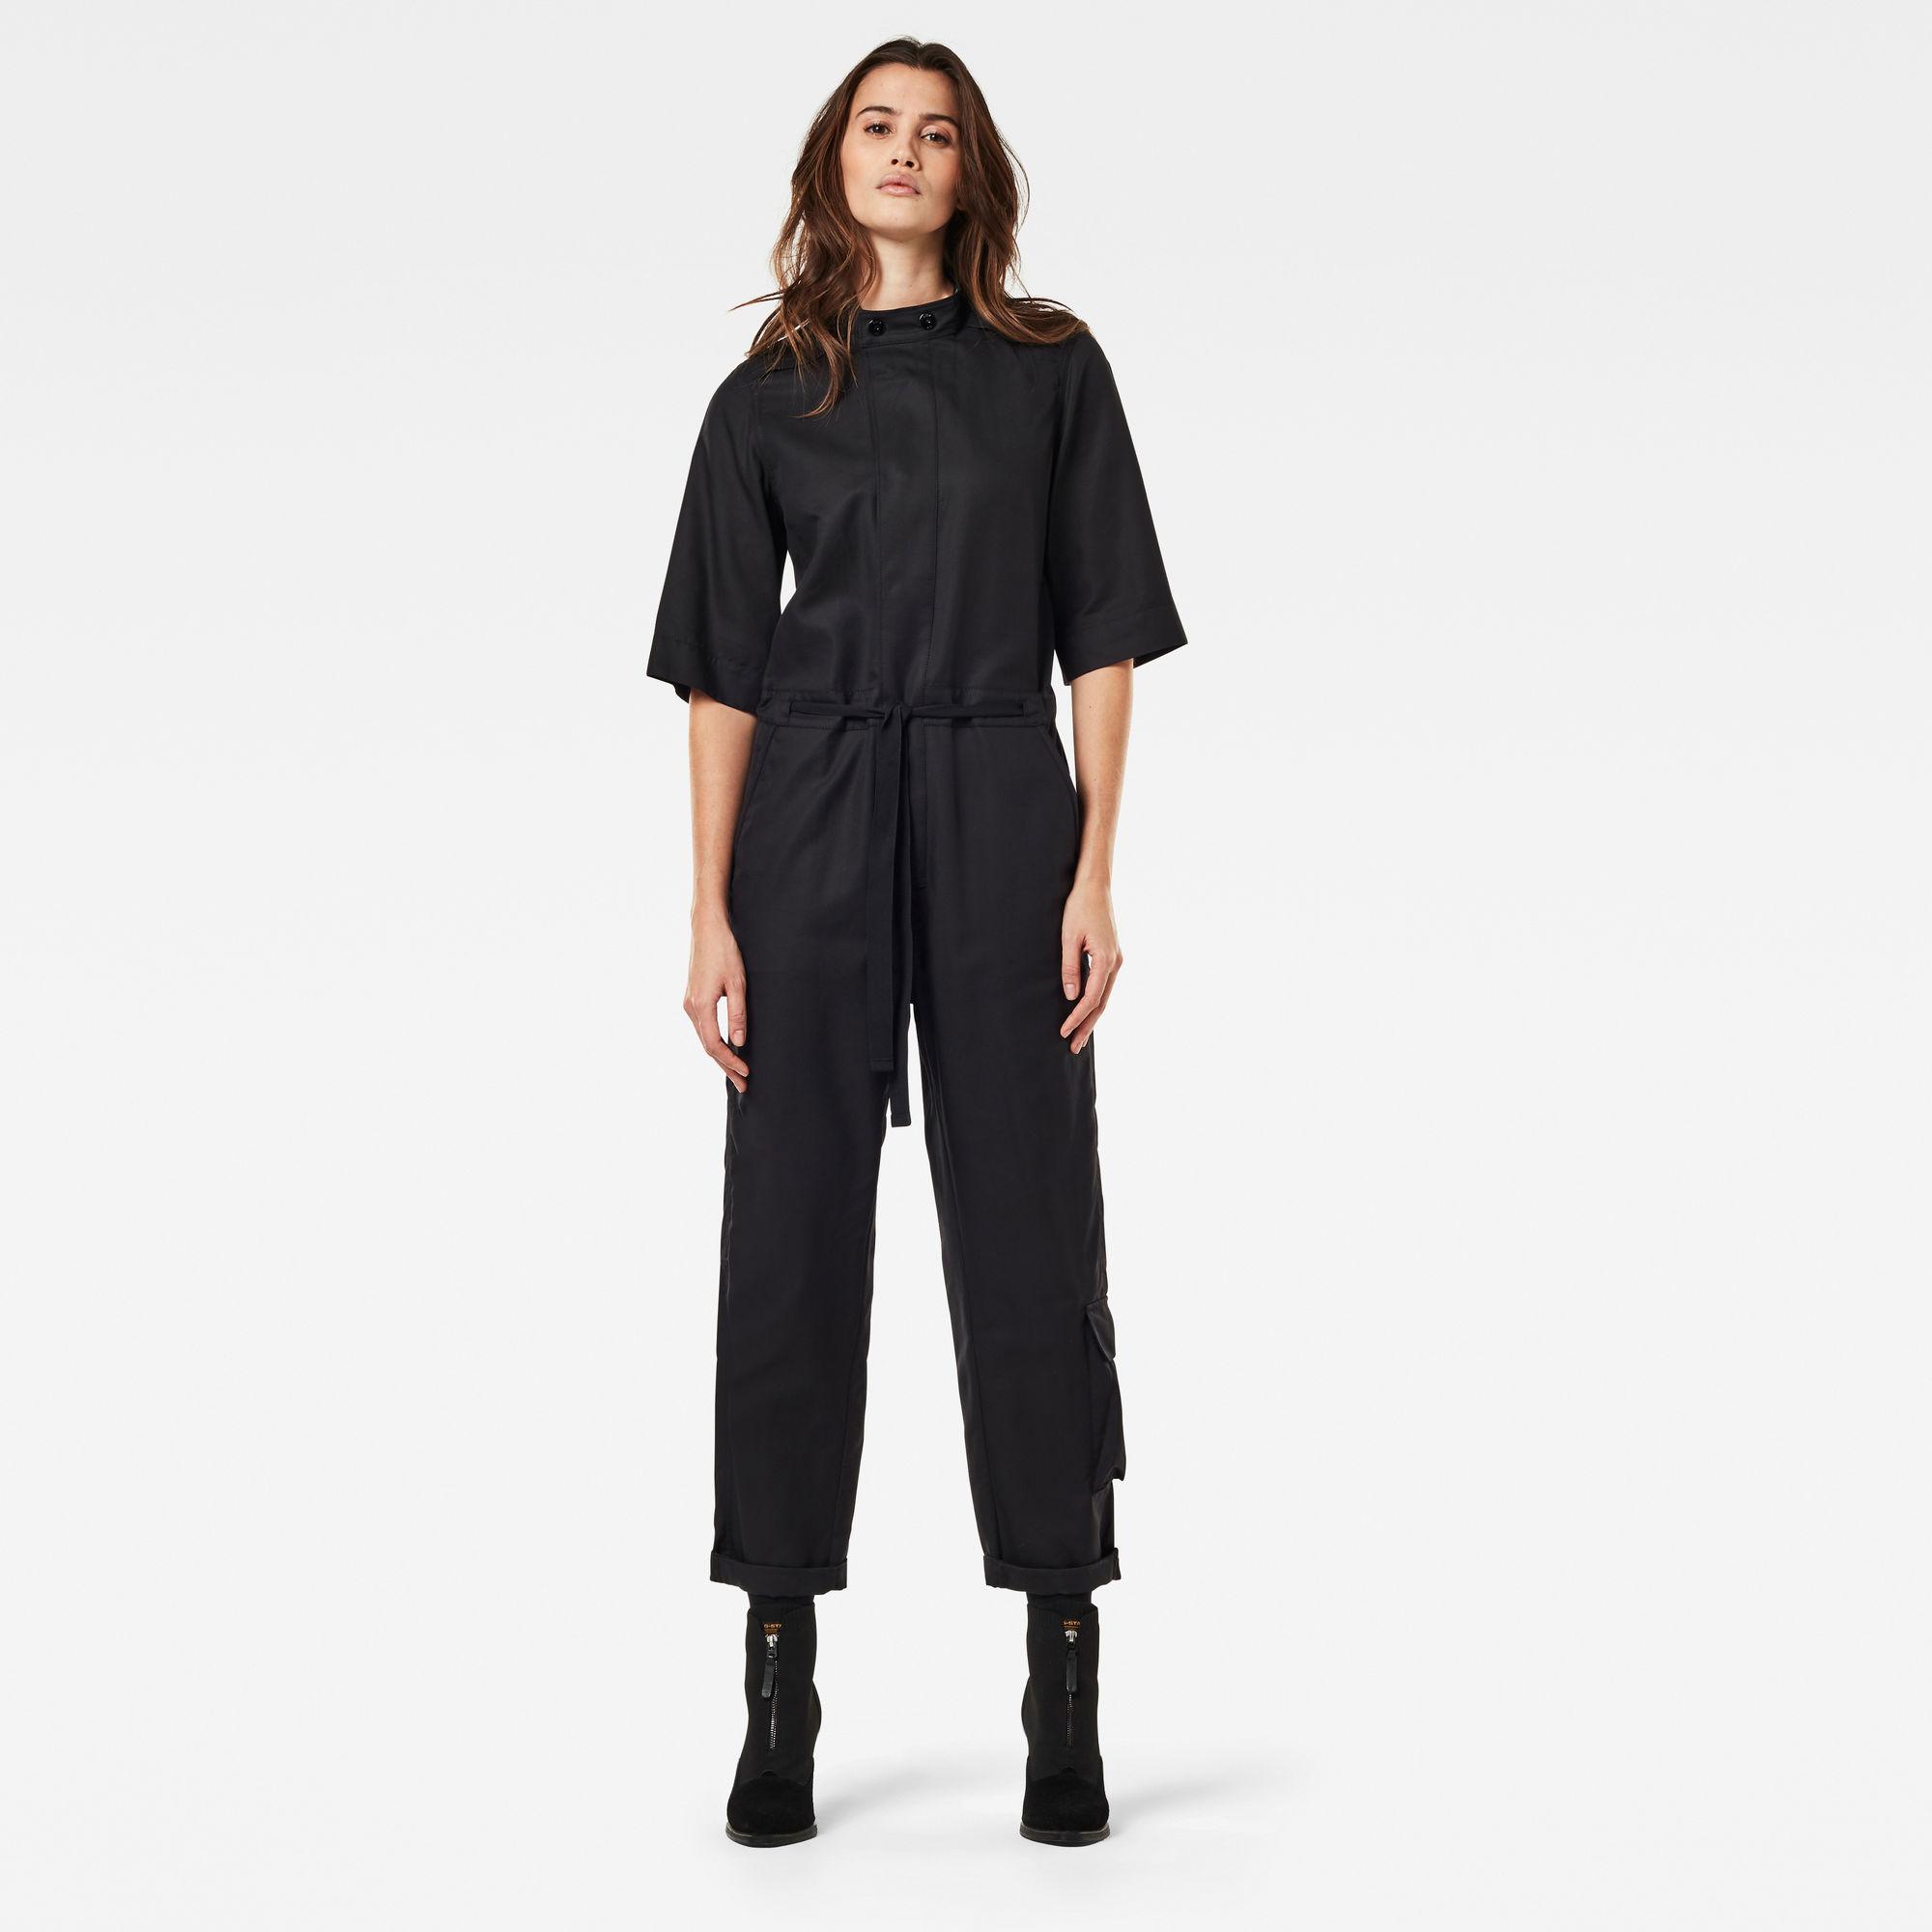 G-Star RAW Dames Workwear Jumpsuit Korte Mouw Zwart